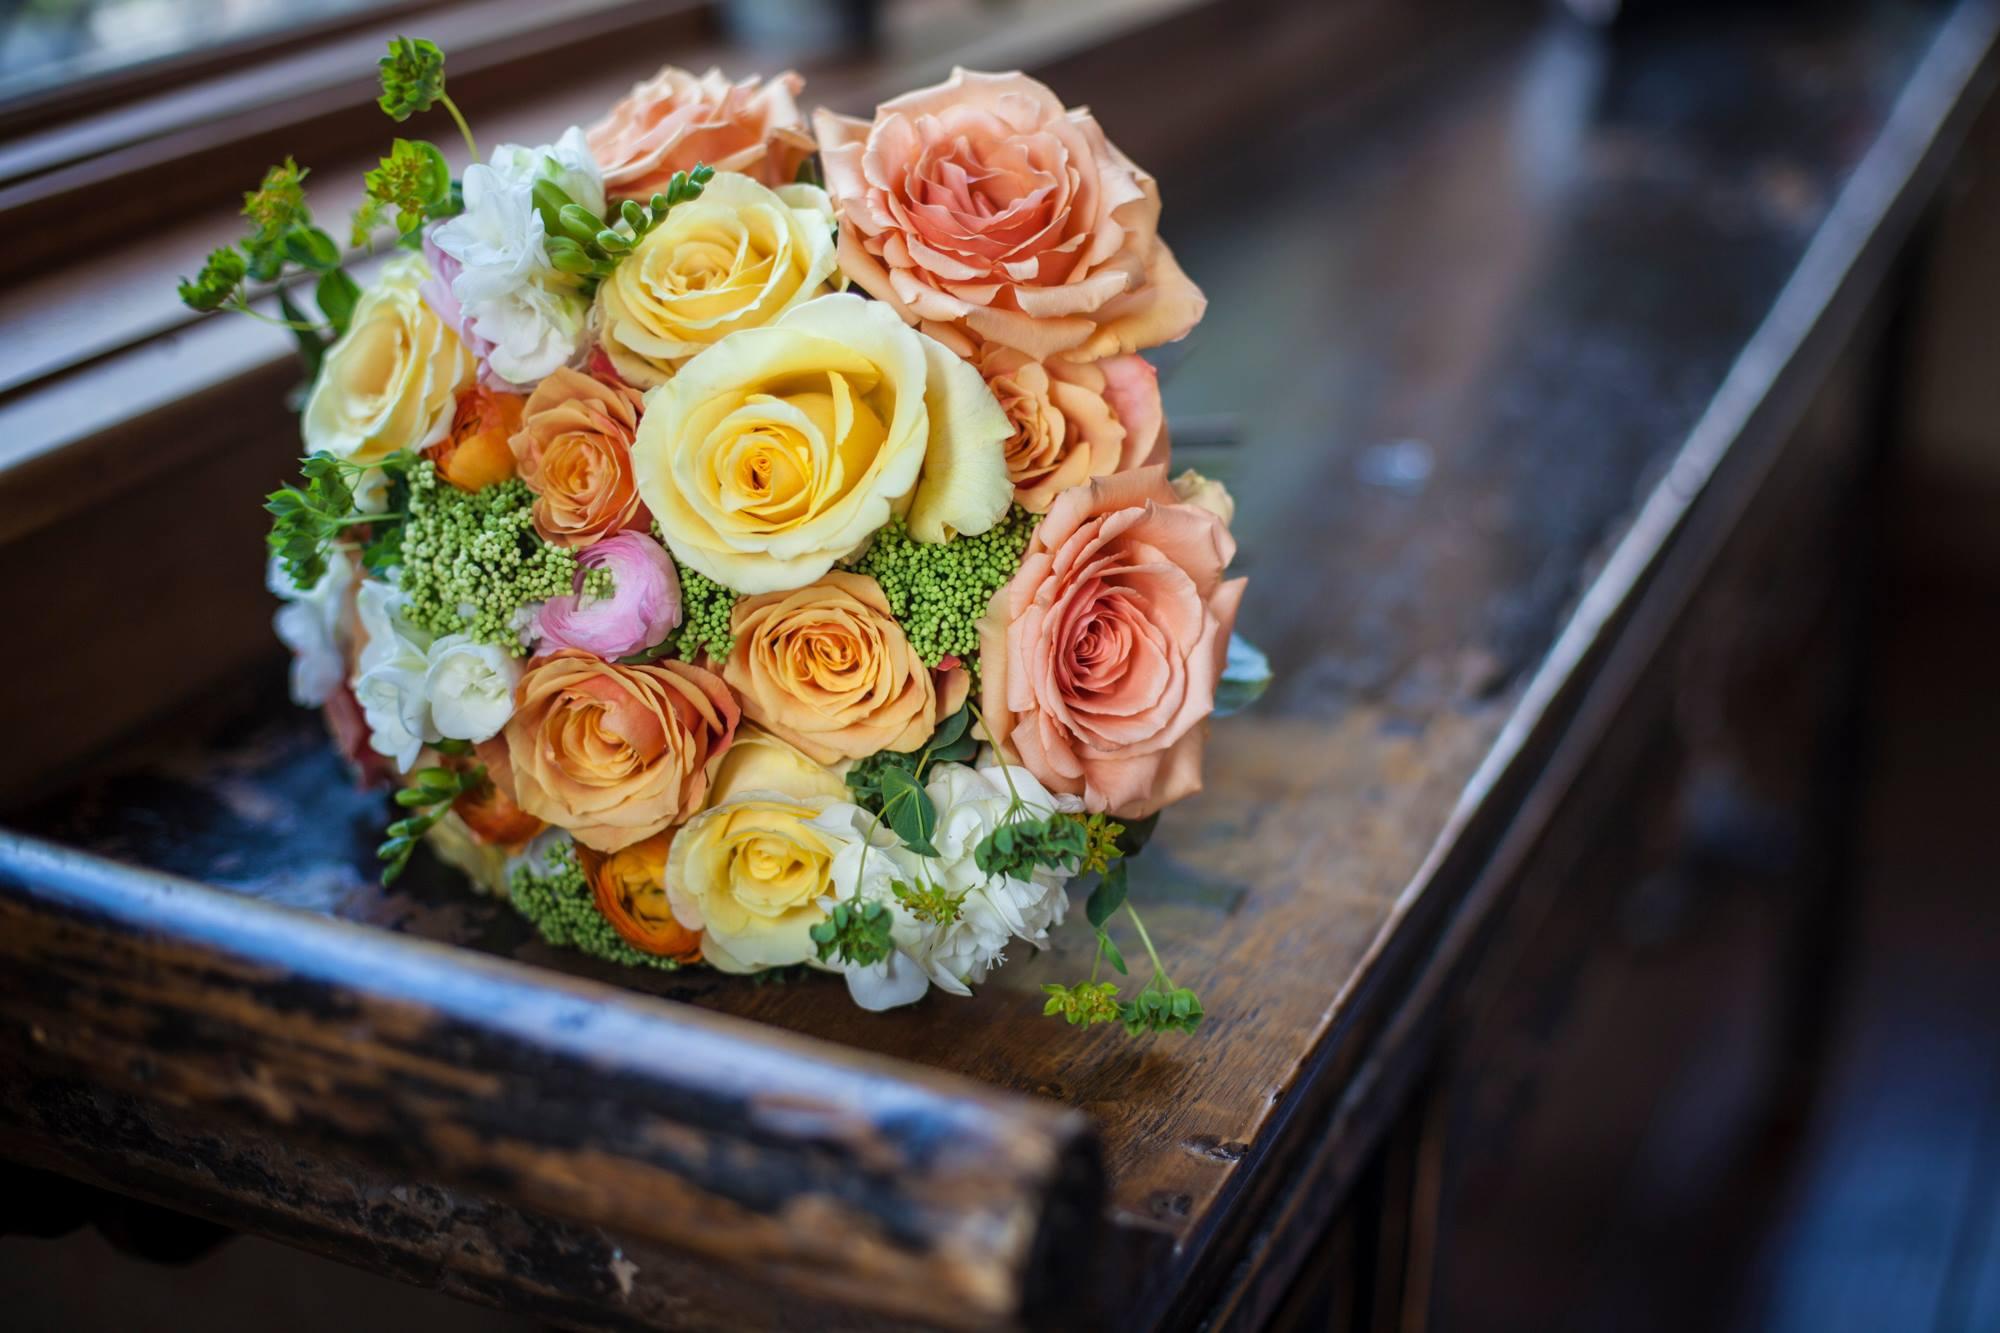 orange-and-yellow-rose-bridal-bouquet-rustic-wedding-painter-ben-keys-breckenridge-wedding-artist